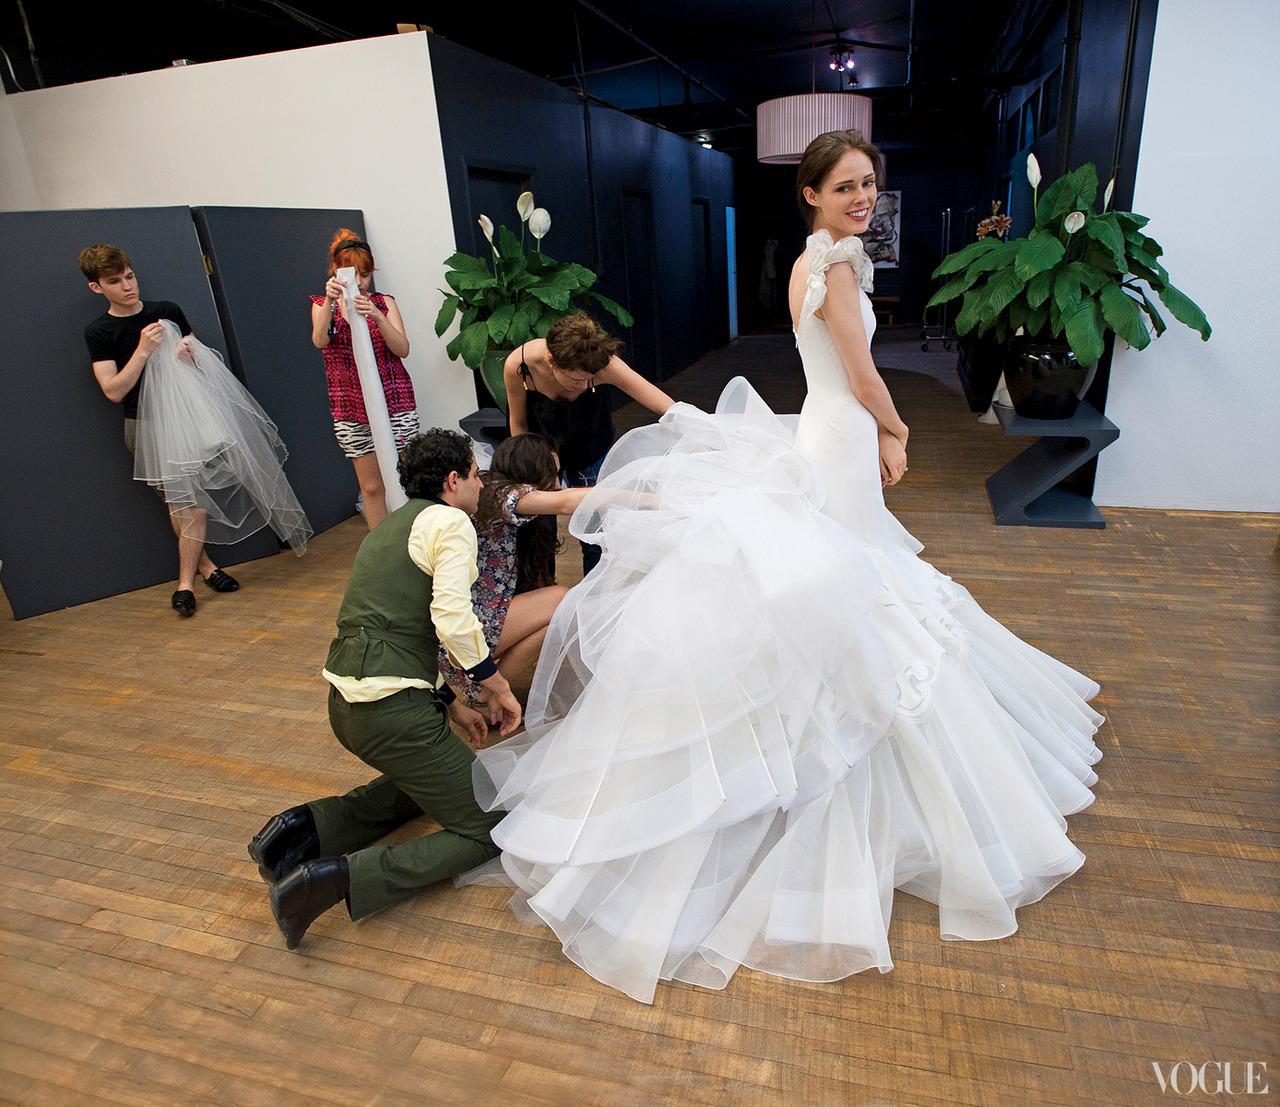 coco rocha wedding dress zac posen zac posen wedding dresses Coco Rocha Wedding Dress Zac Posen 81